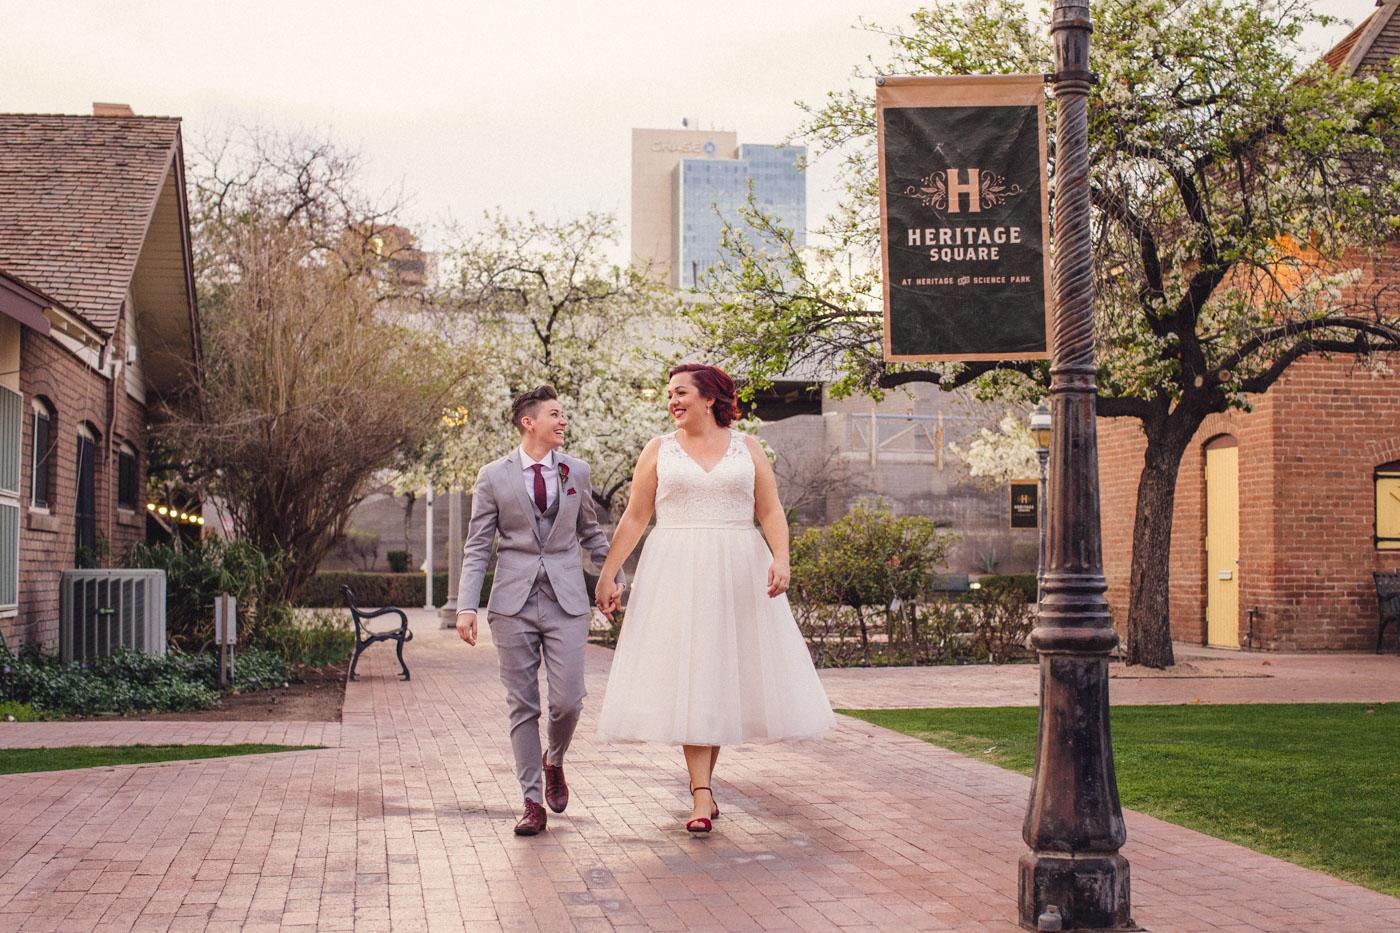 heritage-square-wedding-phoenix-az